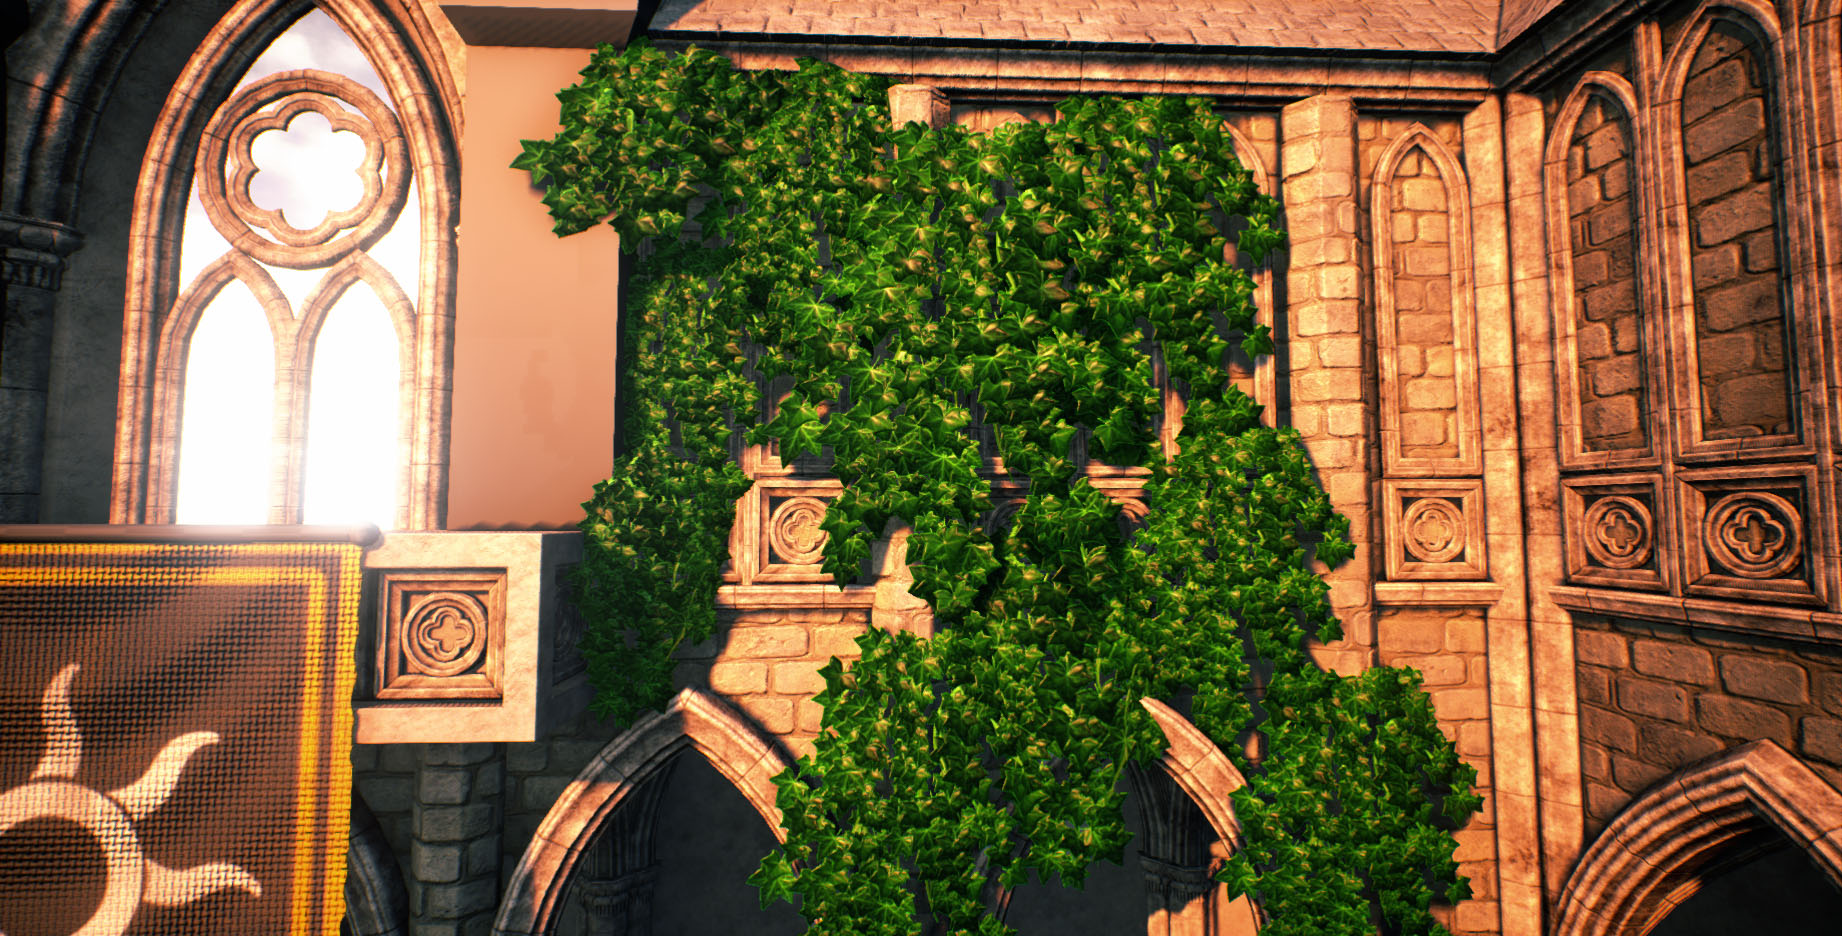 courtyard_wip8_ivy.jpg